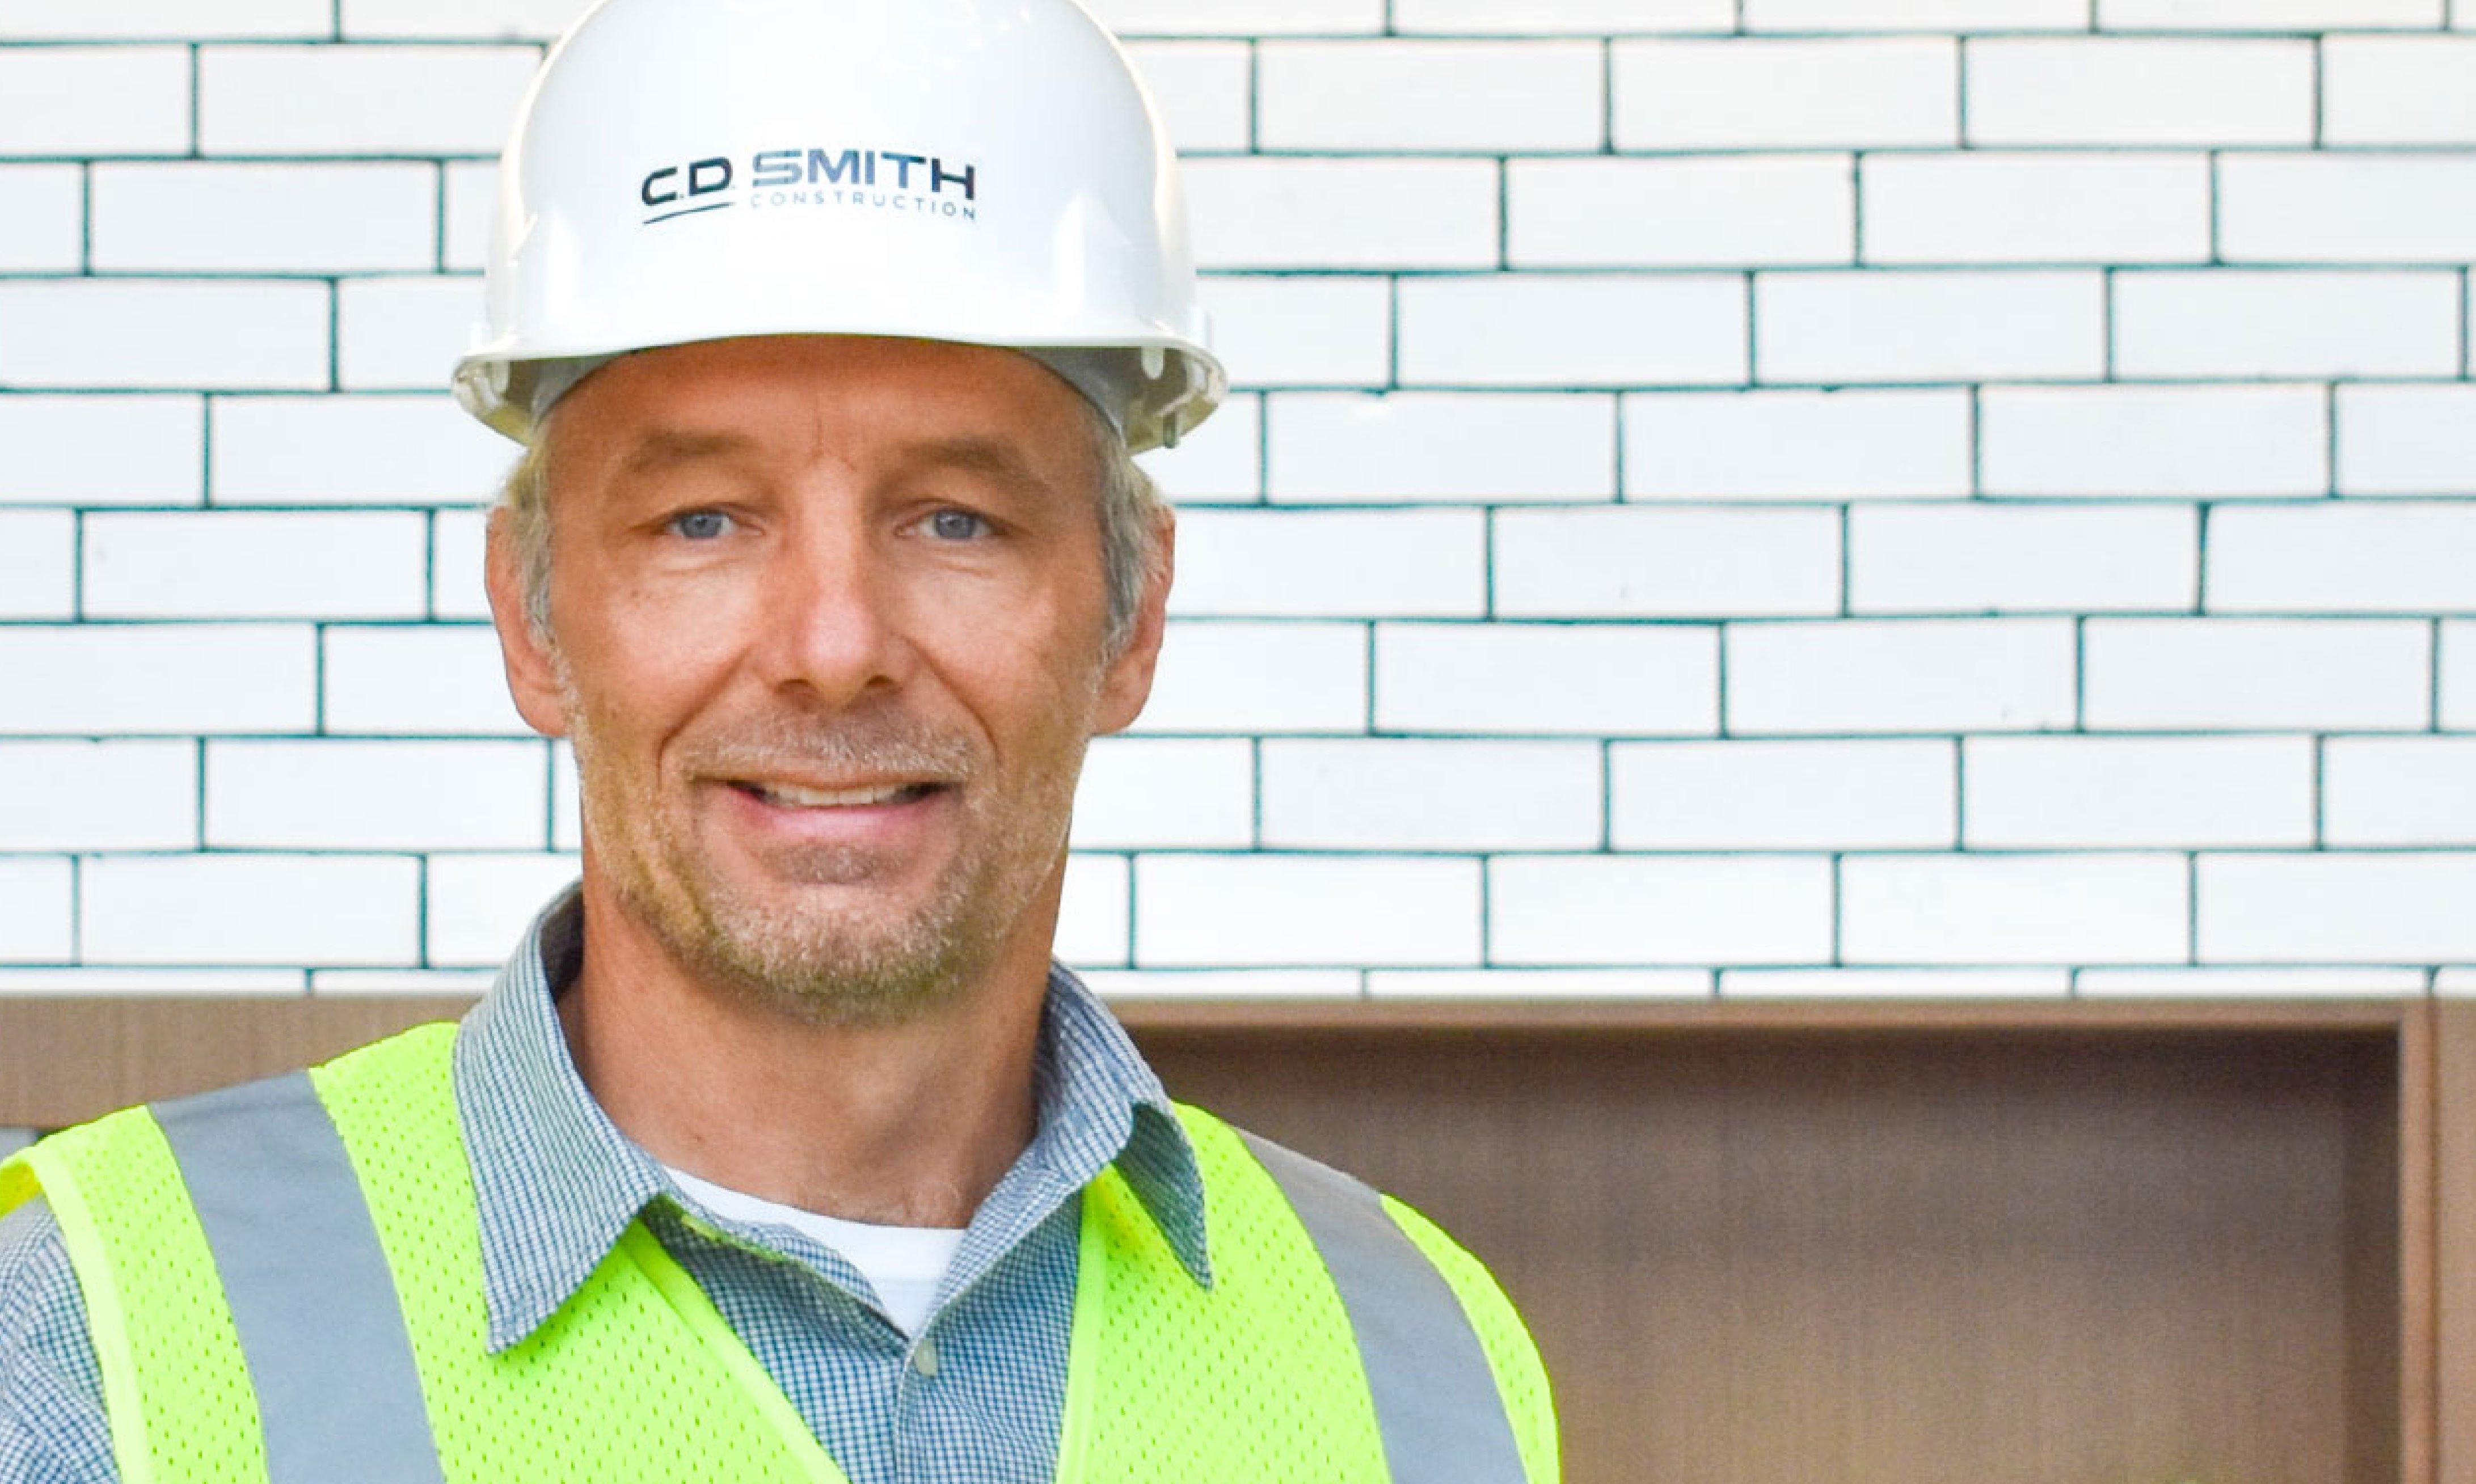 C.D. Smith Construction Superintendent Wayne Holum